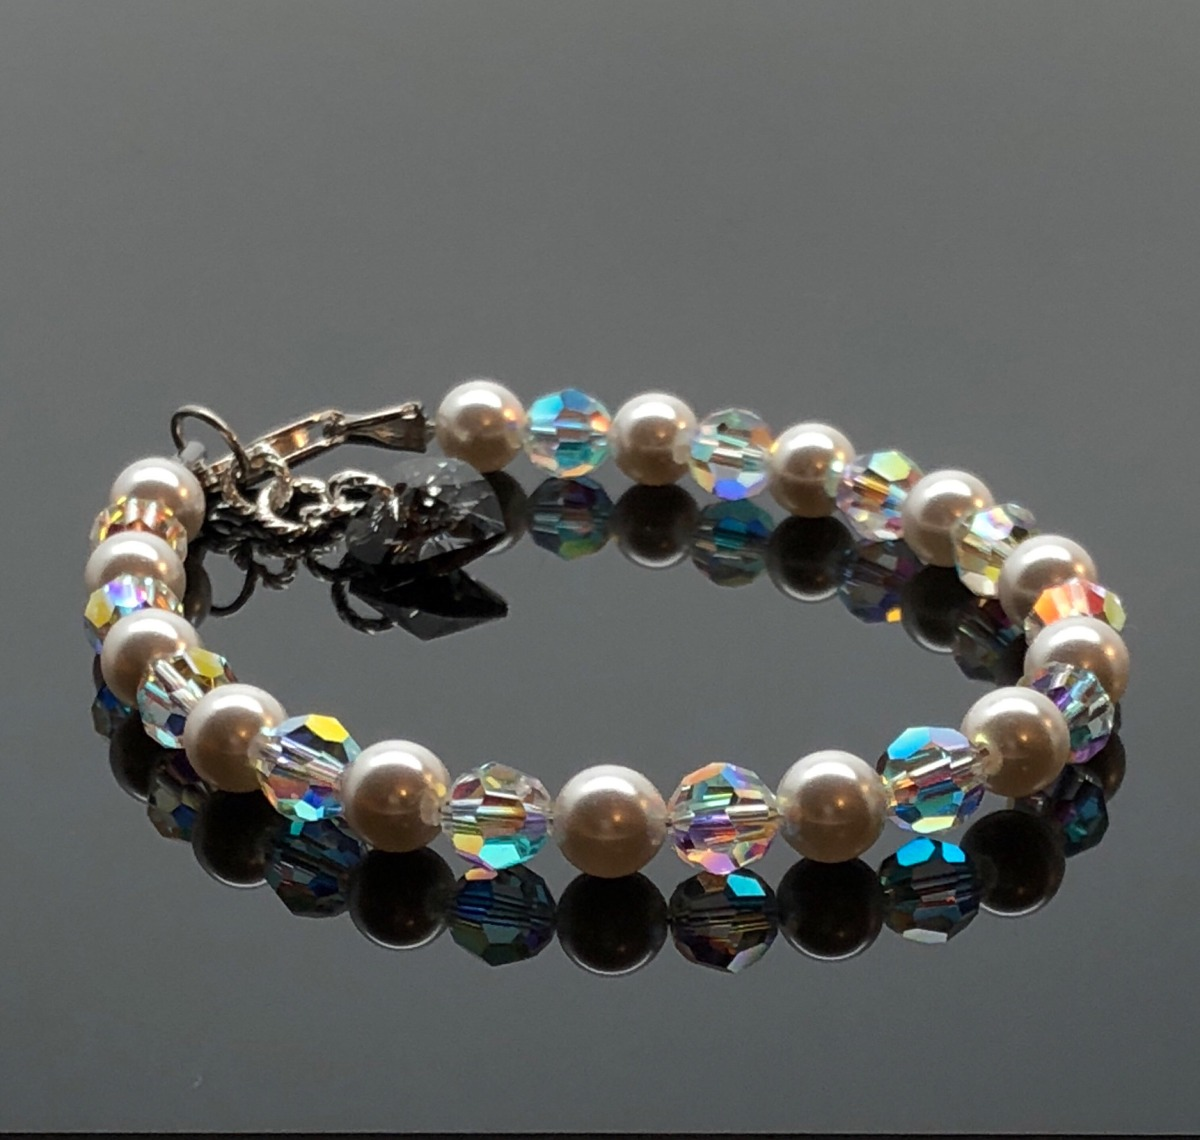 4fdfc18656d9 pulsera cristales swarovski plata 925 garantia mujer joyas. Cargando zoom.